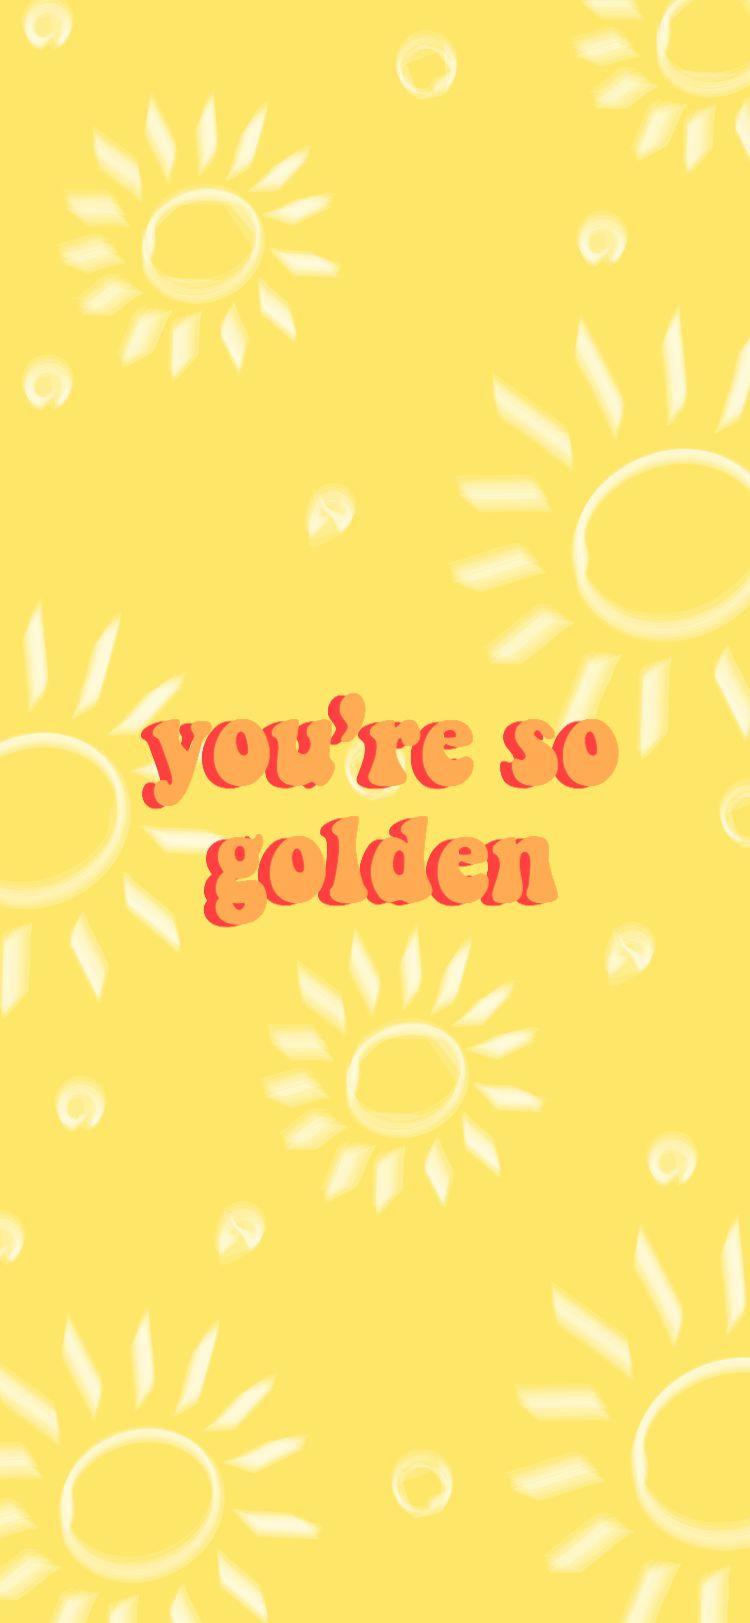 Golden Harry Styles In 2020 Style Lyrics Aesthetic Iphone Wallpaper Unicorn Wallpaper